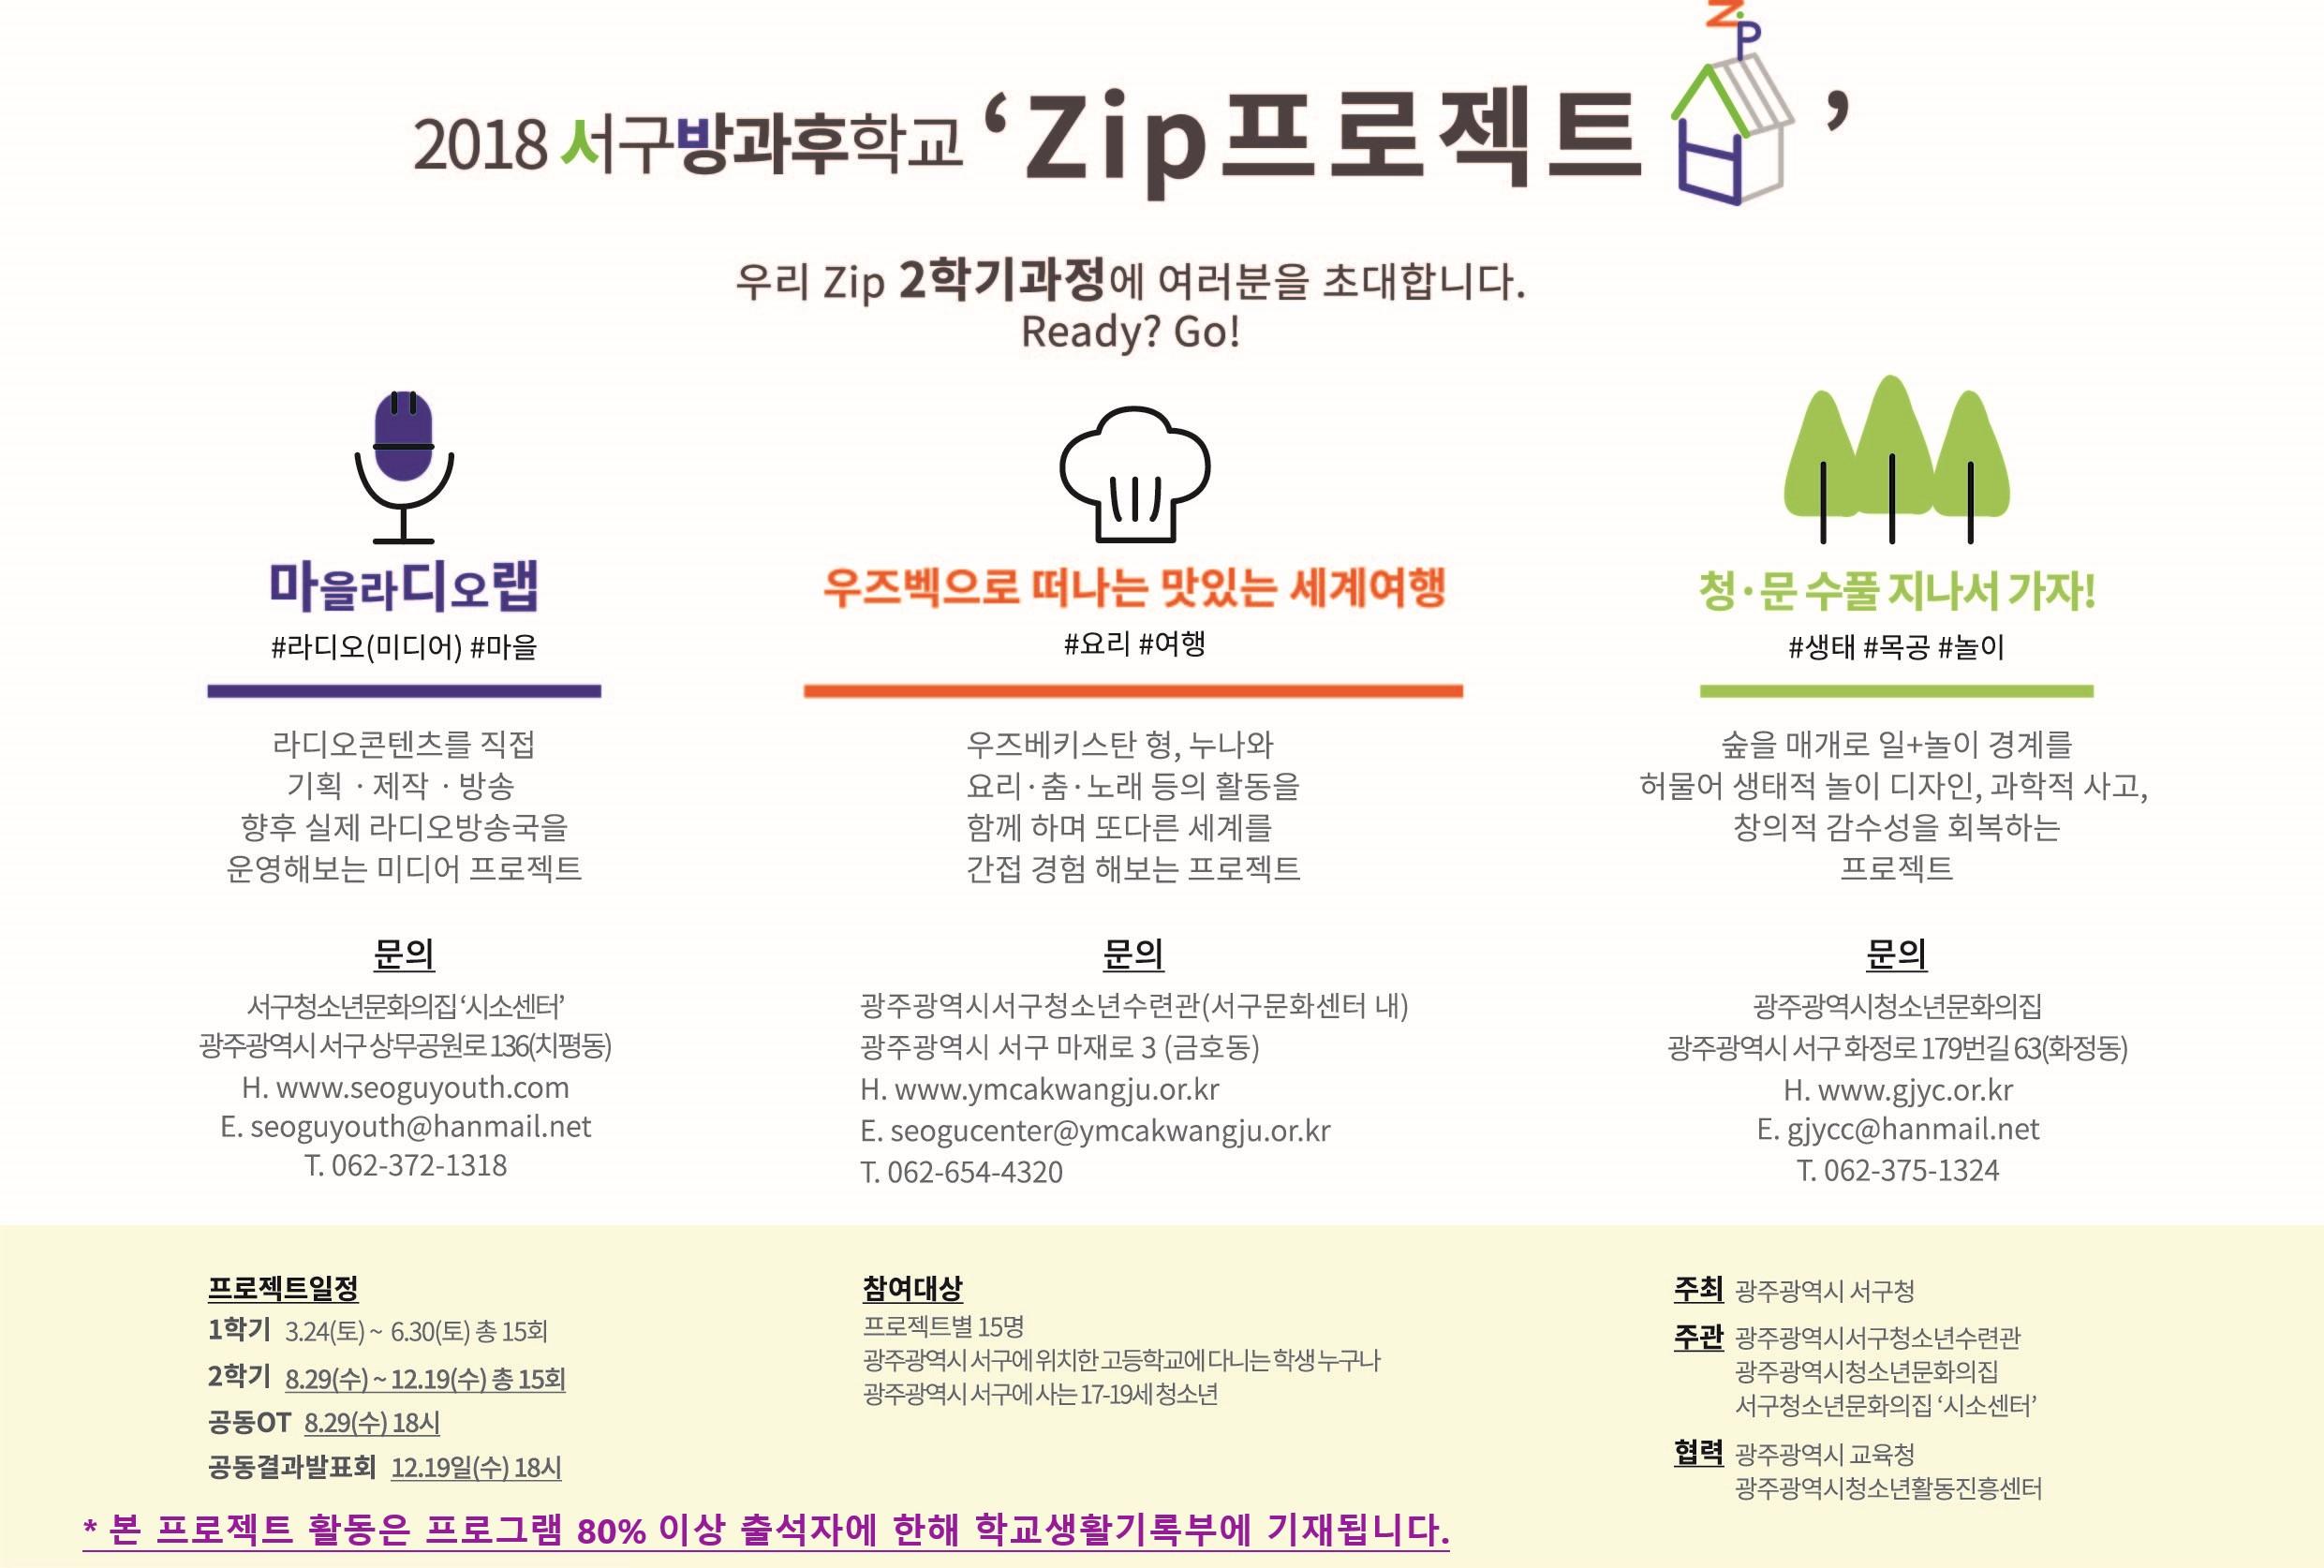 Zip프로젝트_홍보전단용_2학기_수정.jpg